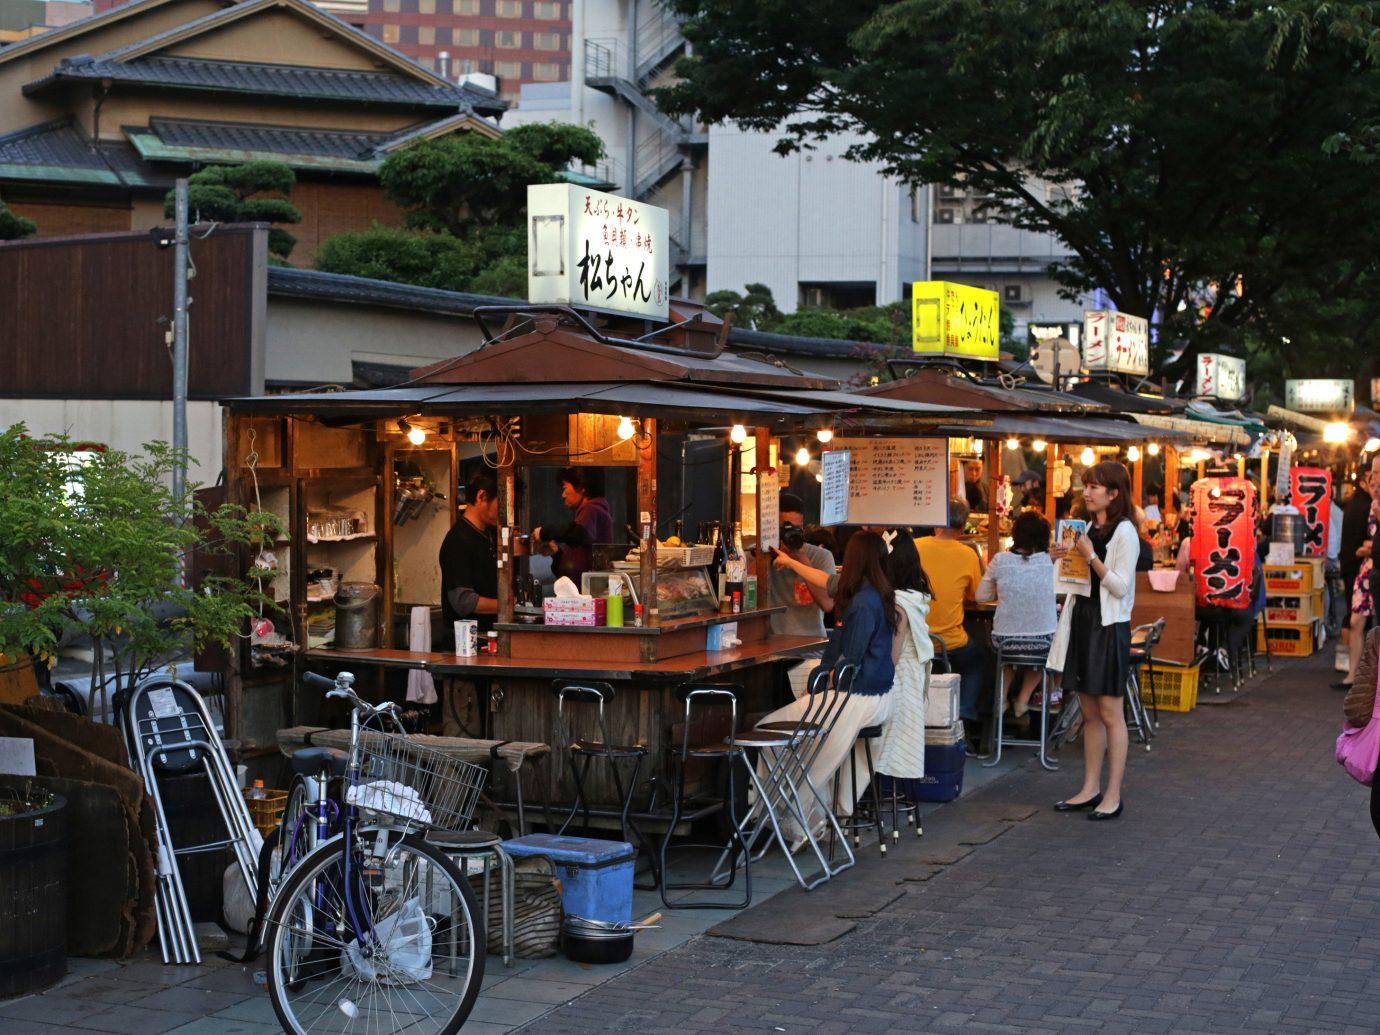 Japan Trip Ideas marketplace market public space stall Town street City pedestrian Downtown bazaar